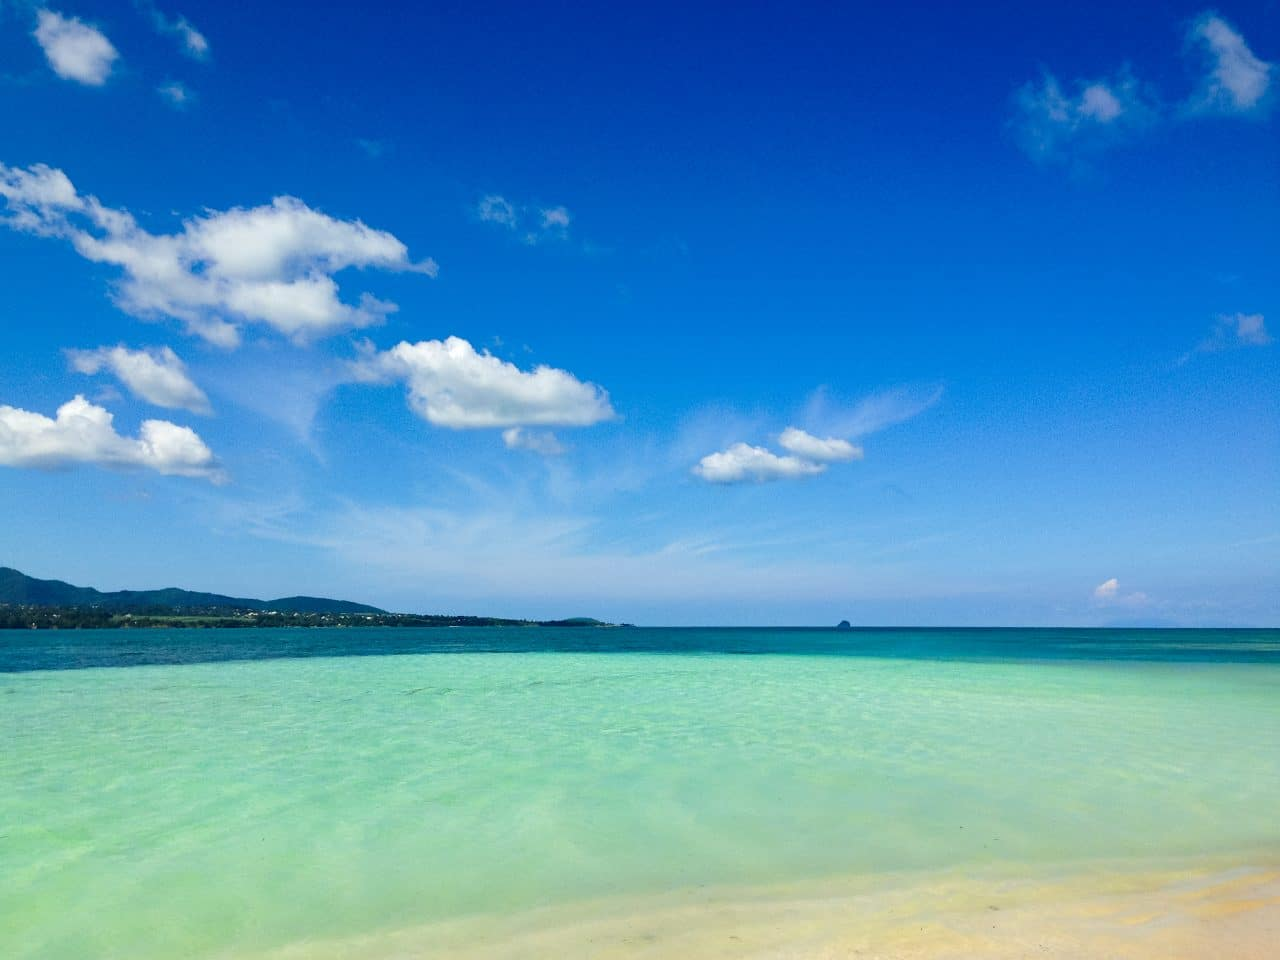 guadeloupe, grand cul de sac marin, sainte rose, guadeloupe, photographie, paysage, lagon, basse terre